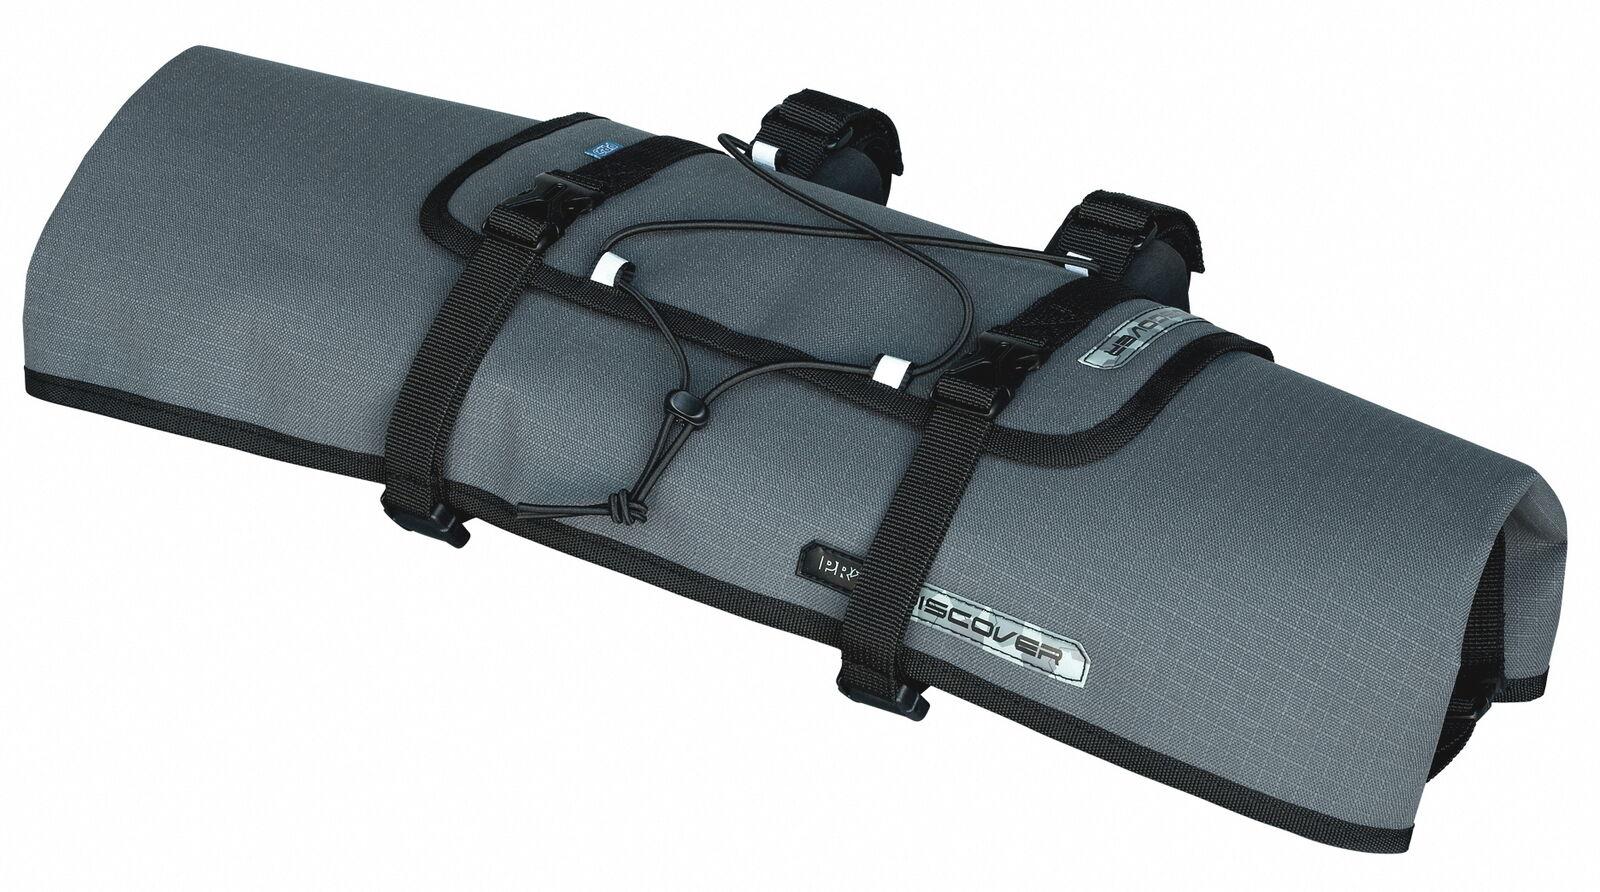 SHIMANO PRO  Discover Handlebar Bag 8L  limit buy